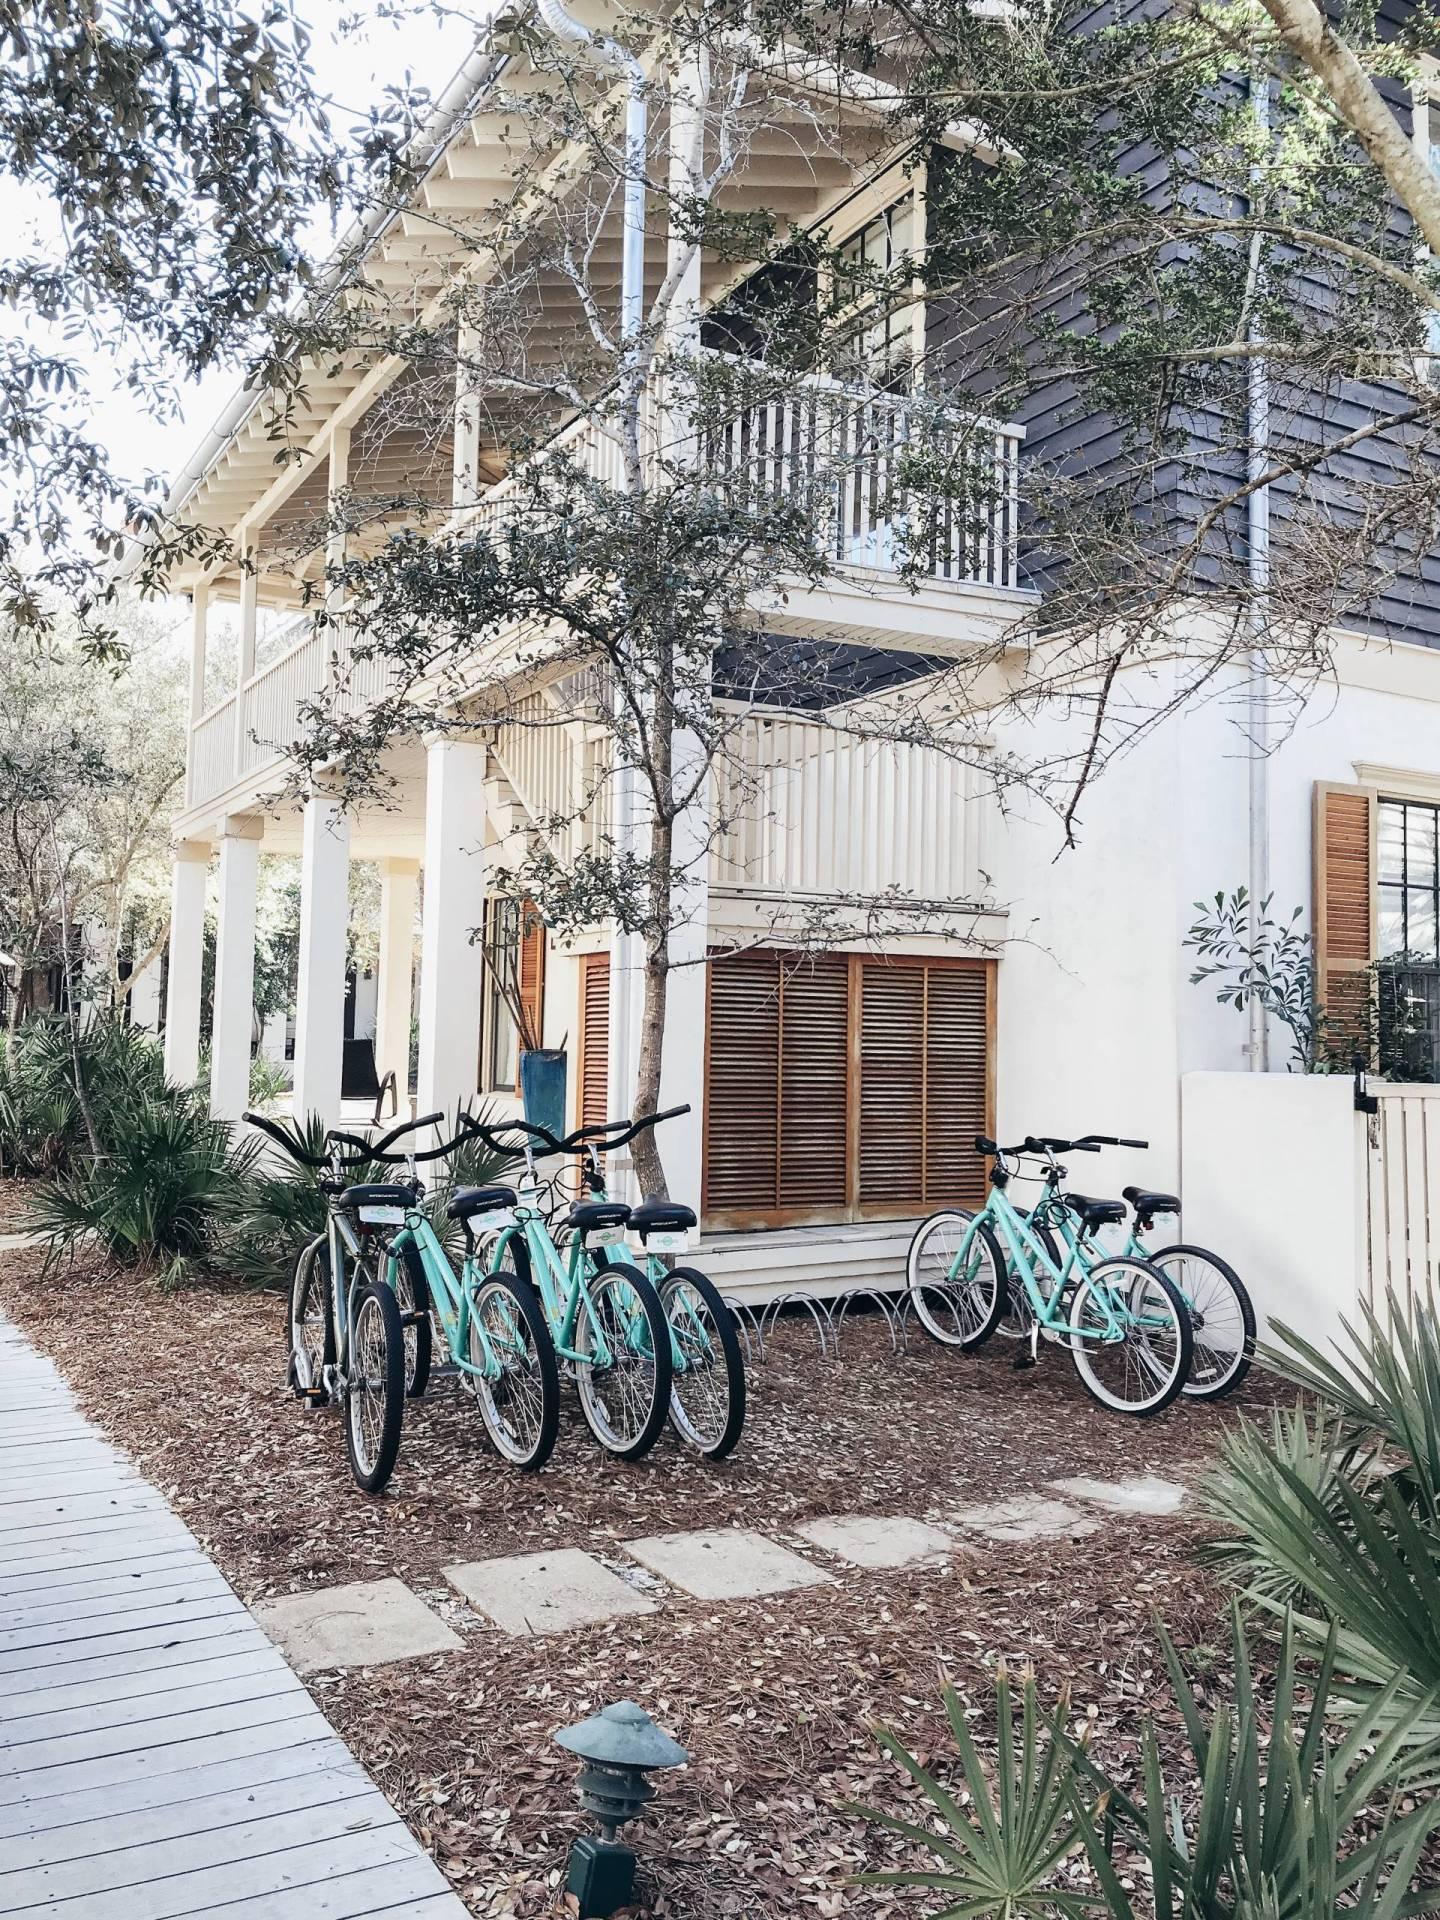 A Guide to Rosemary Beach 30A, Florida's Hidden Gem